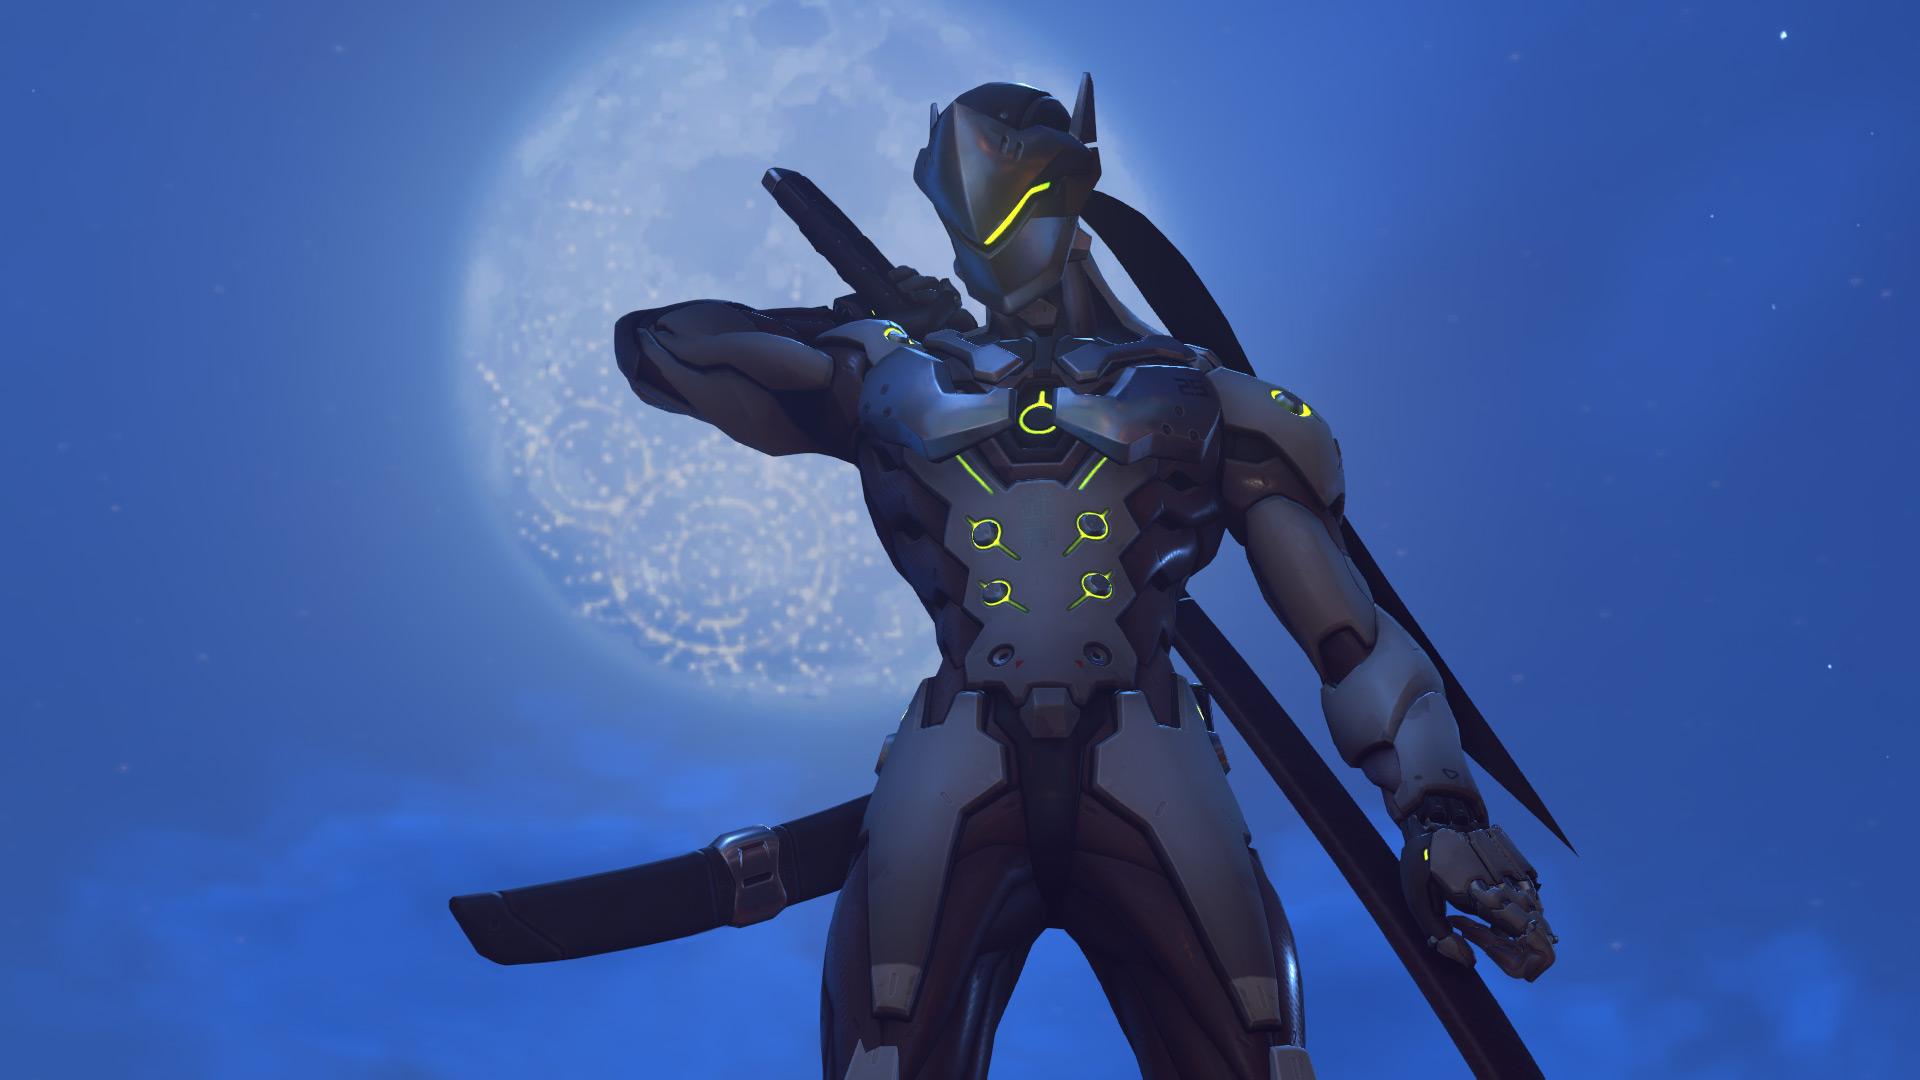 Overwatch Genji in-game